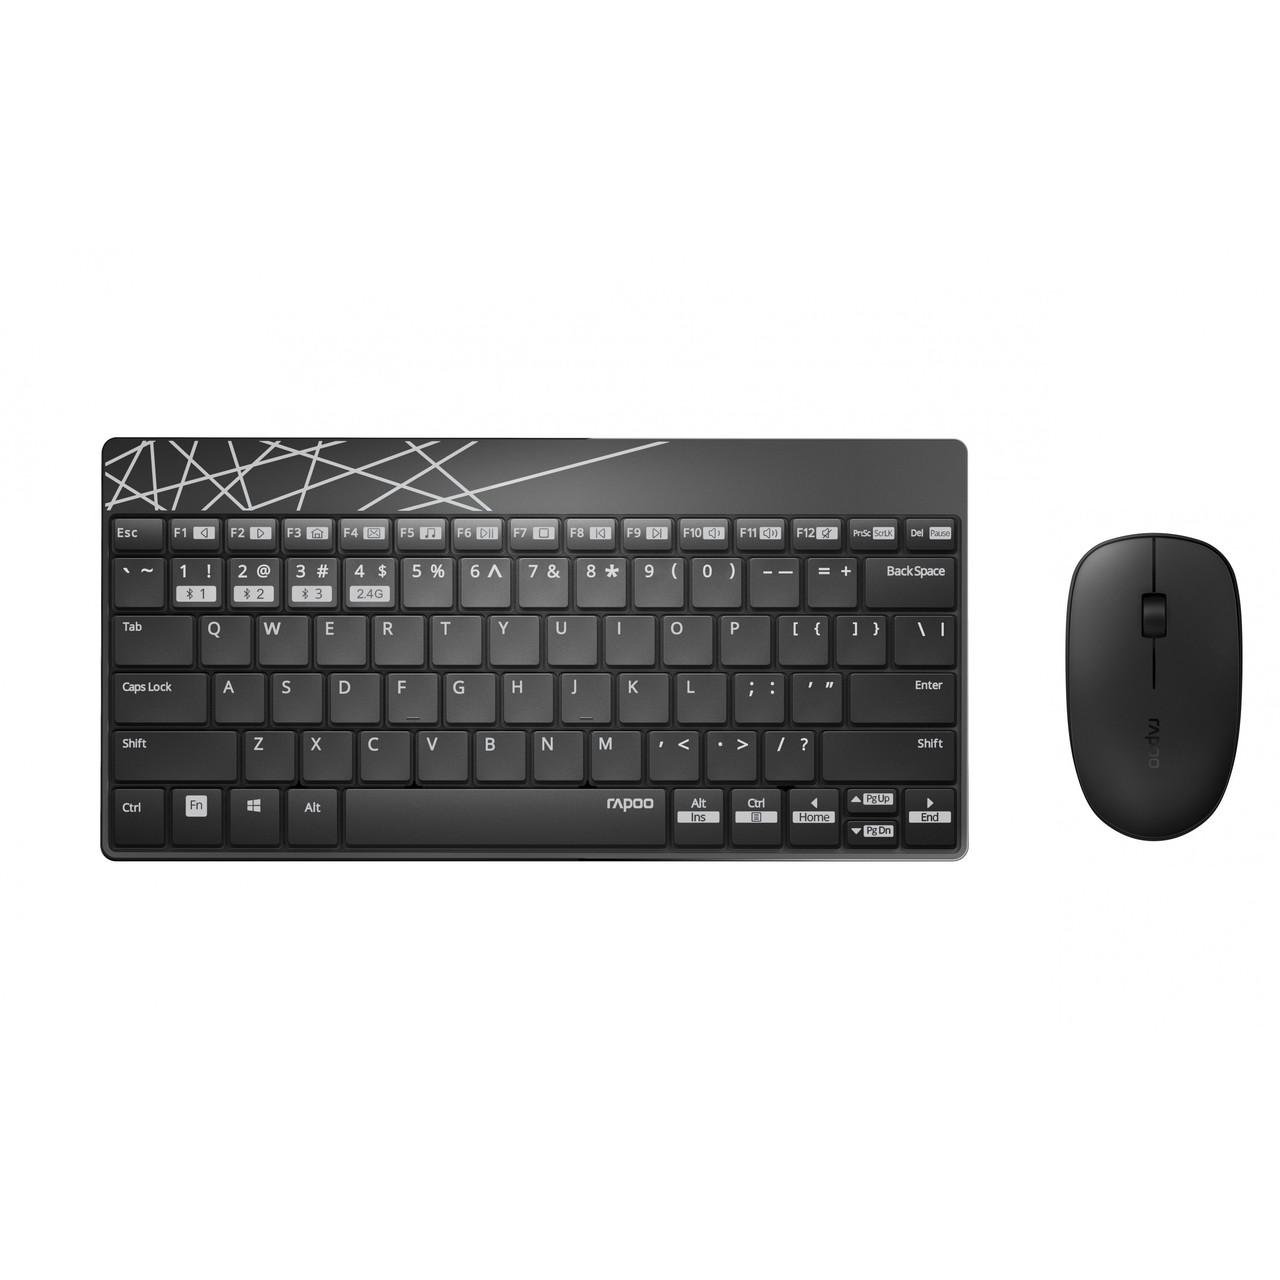 Комплект (клавиатура, мышь) Rapoo 8000M Wireless Black